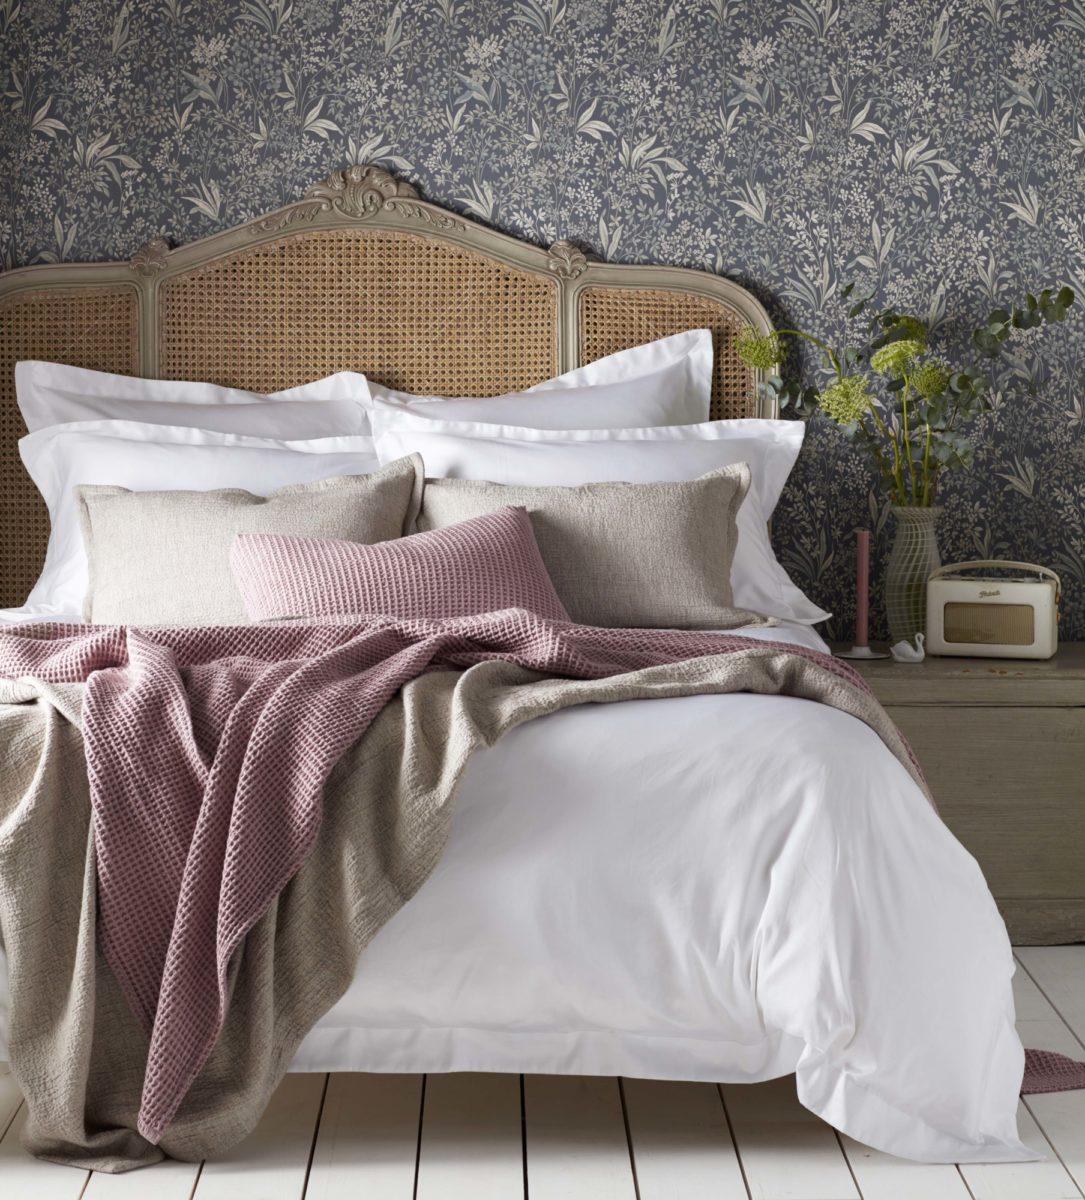 600 Thread Count Luxury White Bedding Secret Linen Store